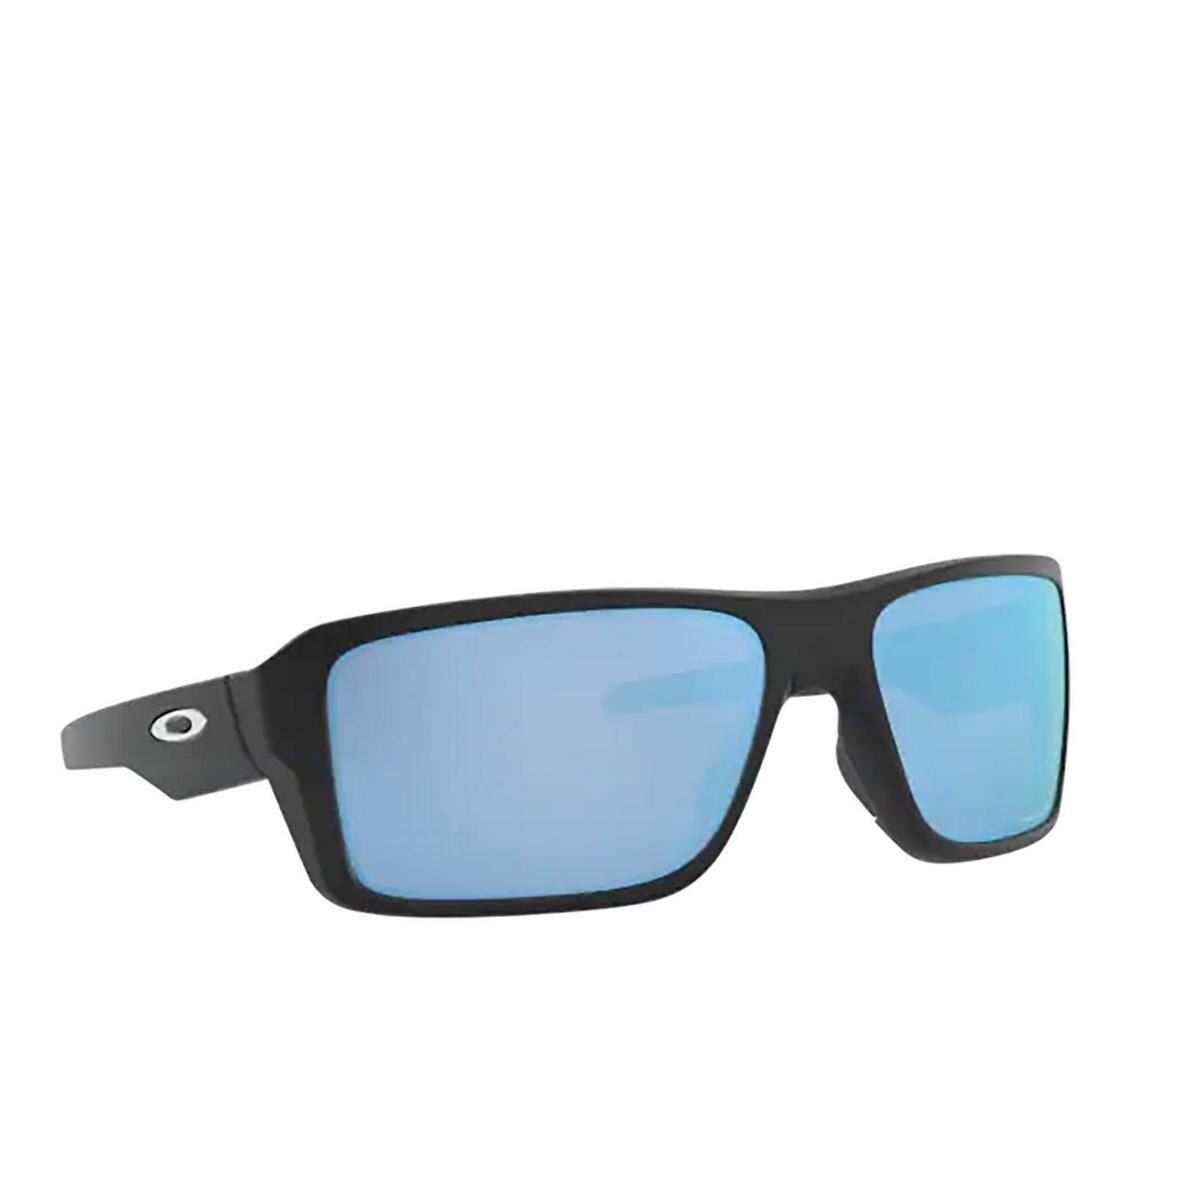 Oakley® Rectangle Sunglasses: Double Edge OO9380 color Matte Black 938013 - three-quarters view.